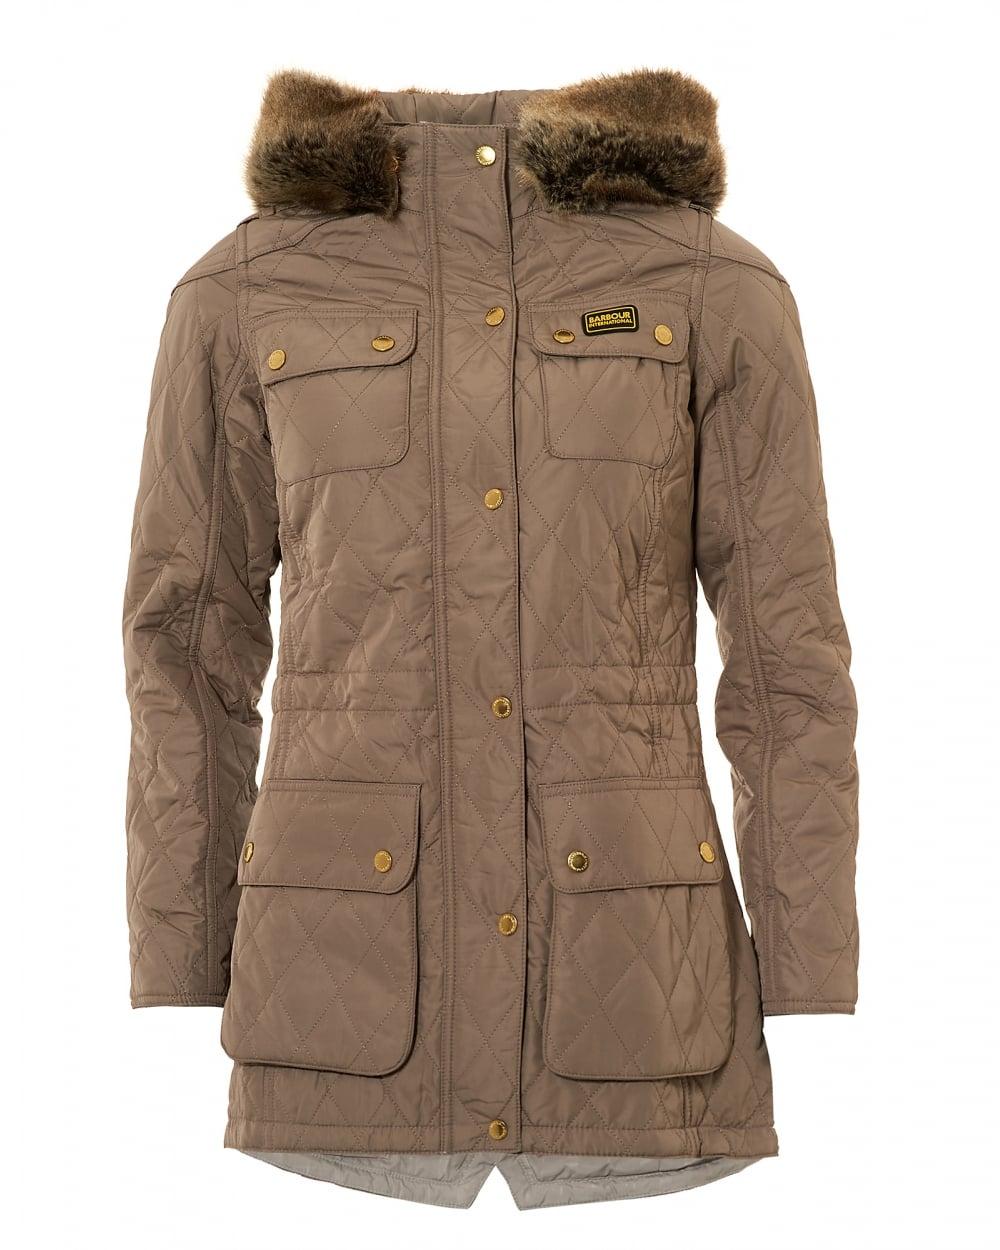 Barbour jackets sale womens